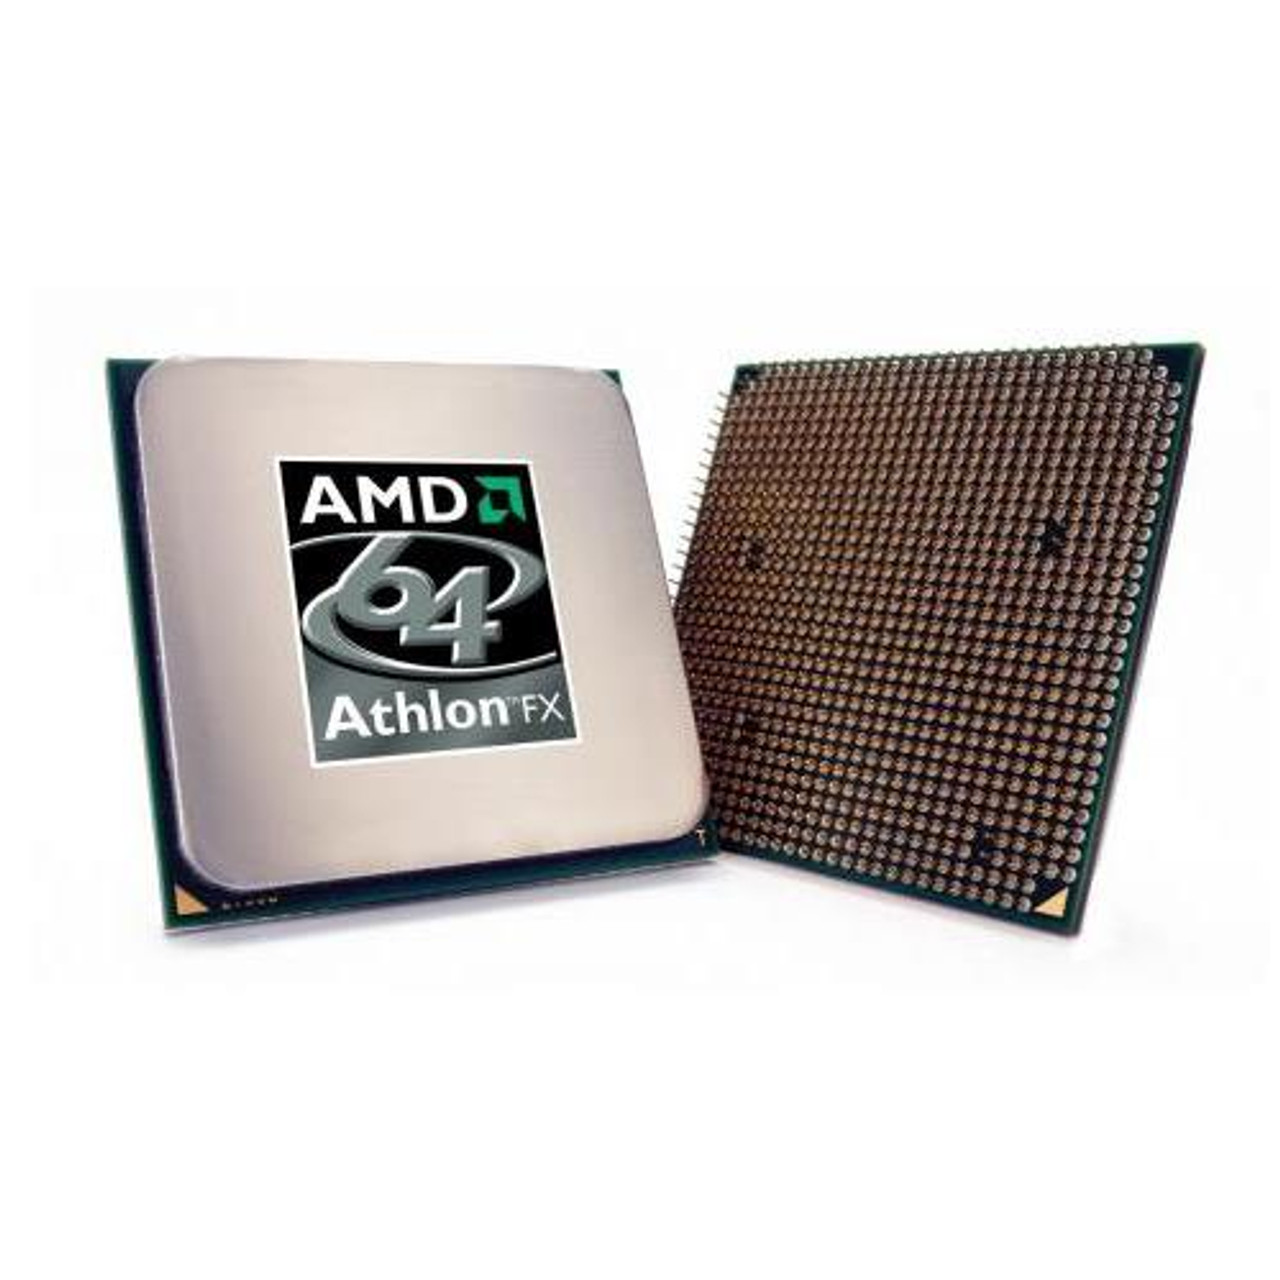 Amn3400bkxsbu Amd Athlon 64 3400 2 2ghz Mobile Processor